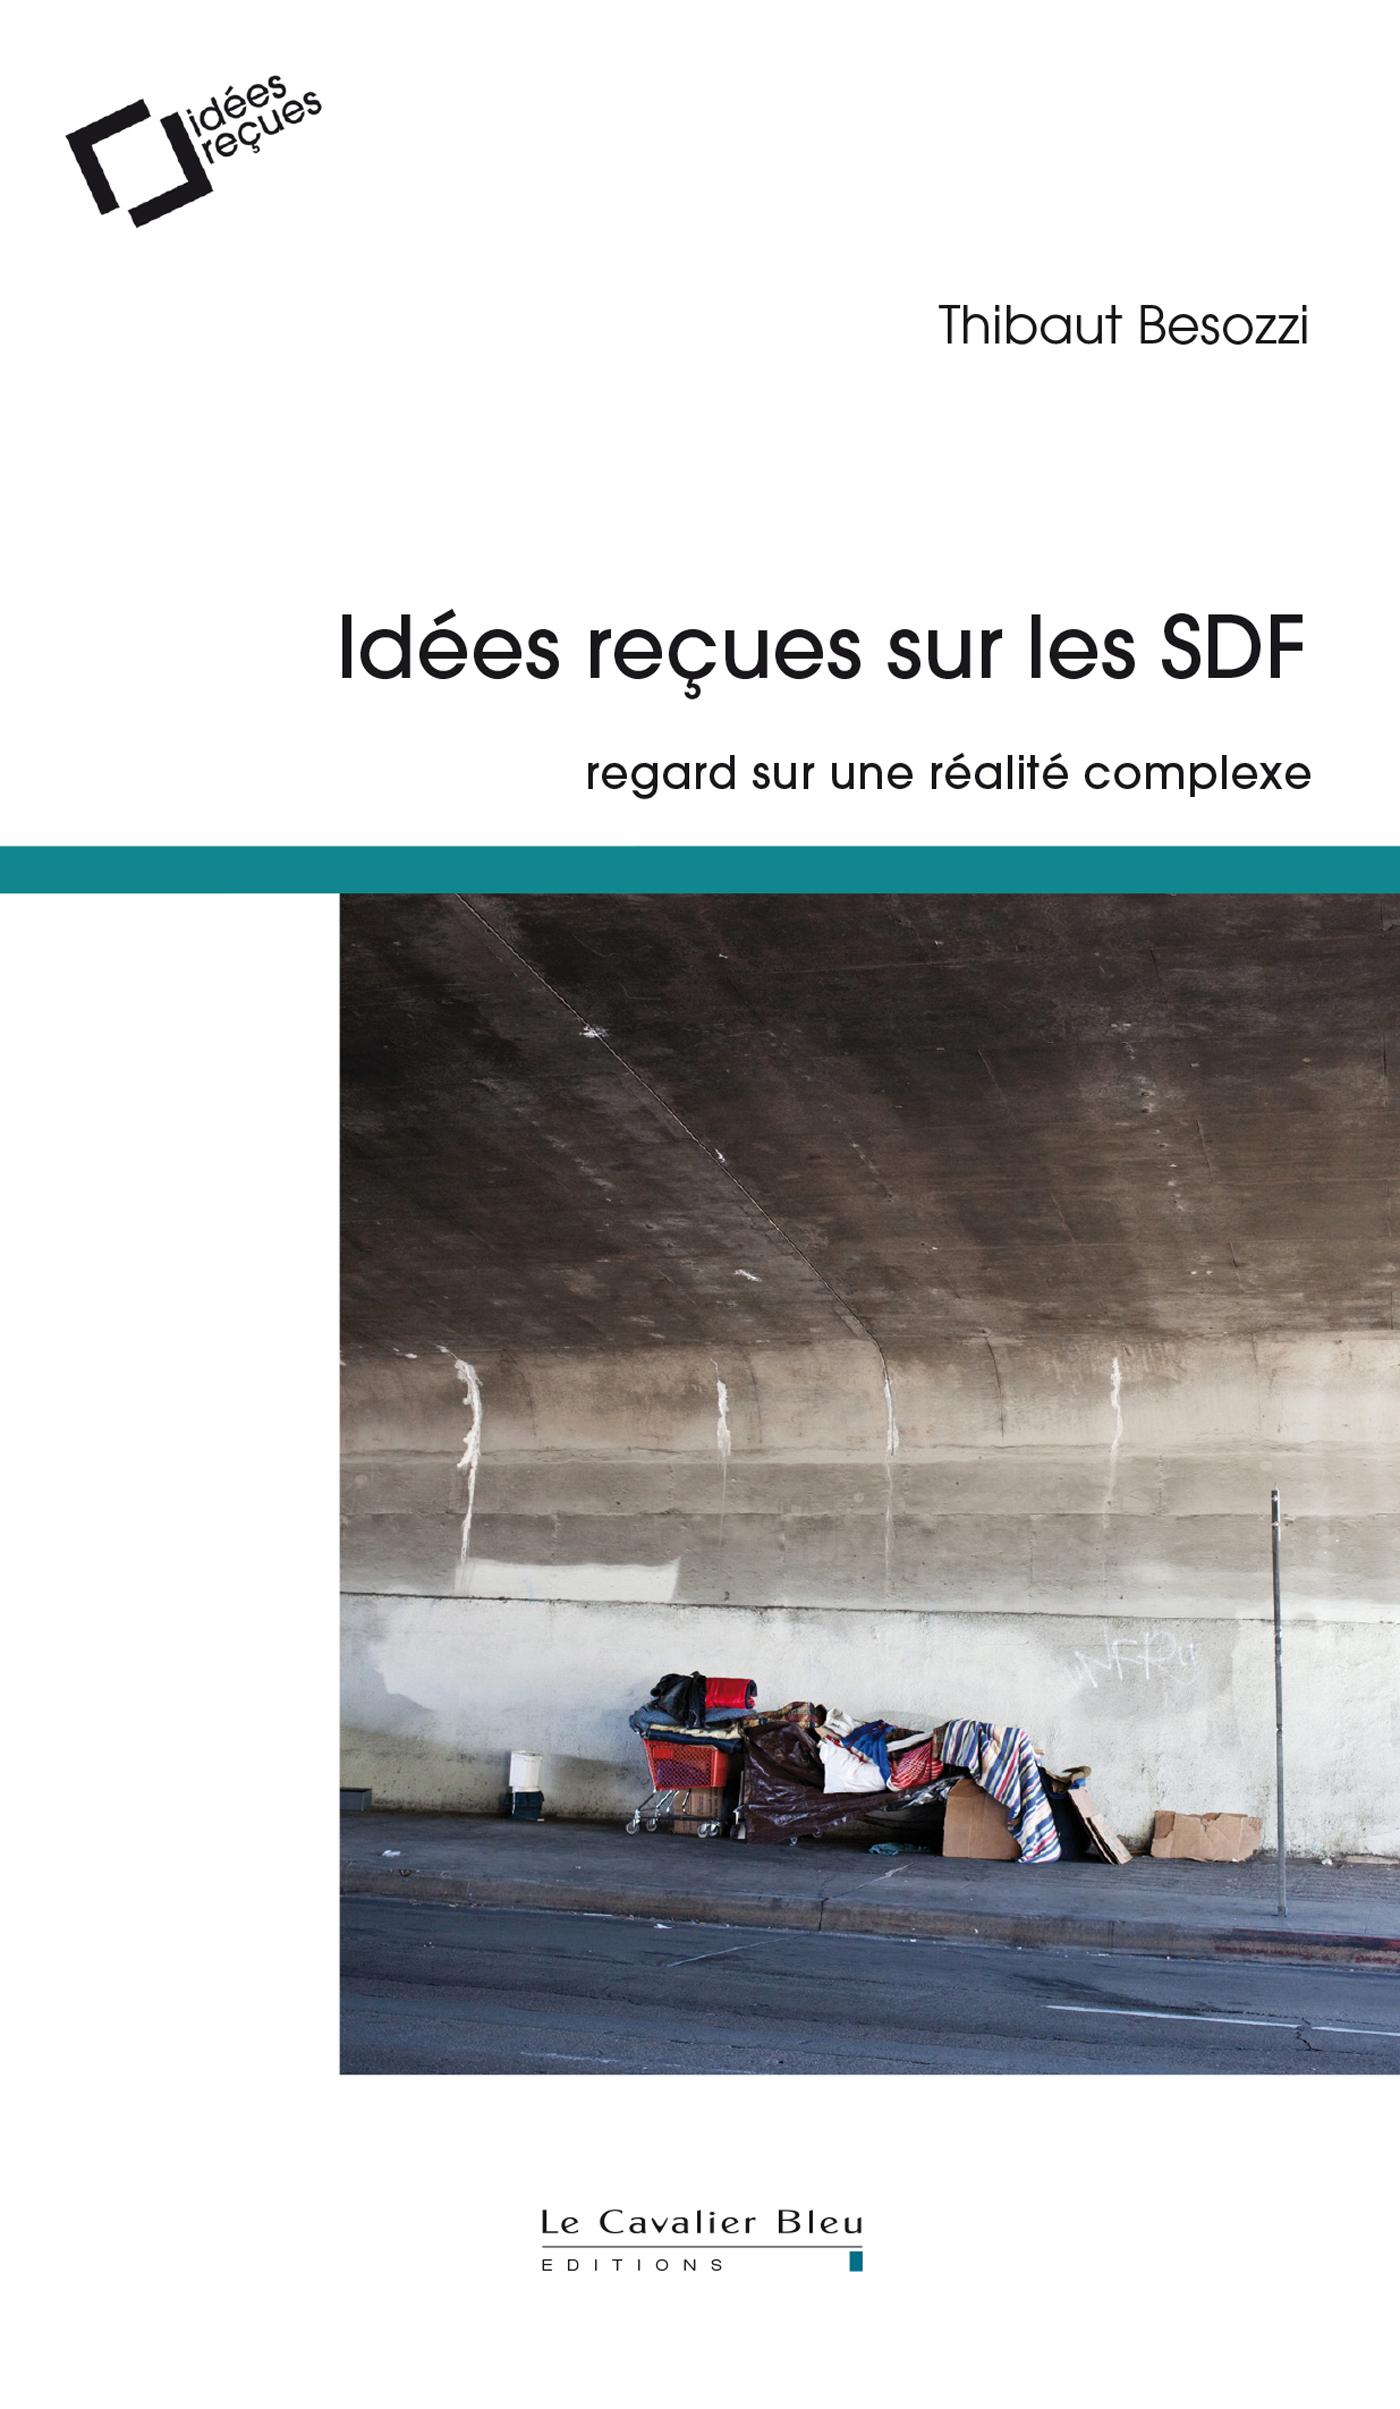 IDEES RECUES SUR LES SDF - REGARD SUR UNE REALITE COMPLEXE